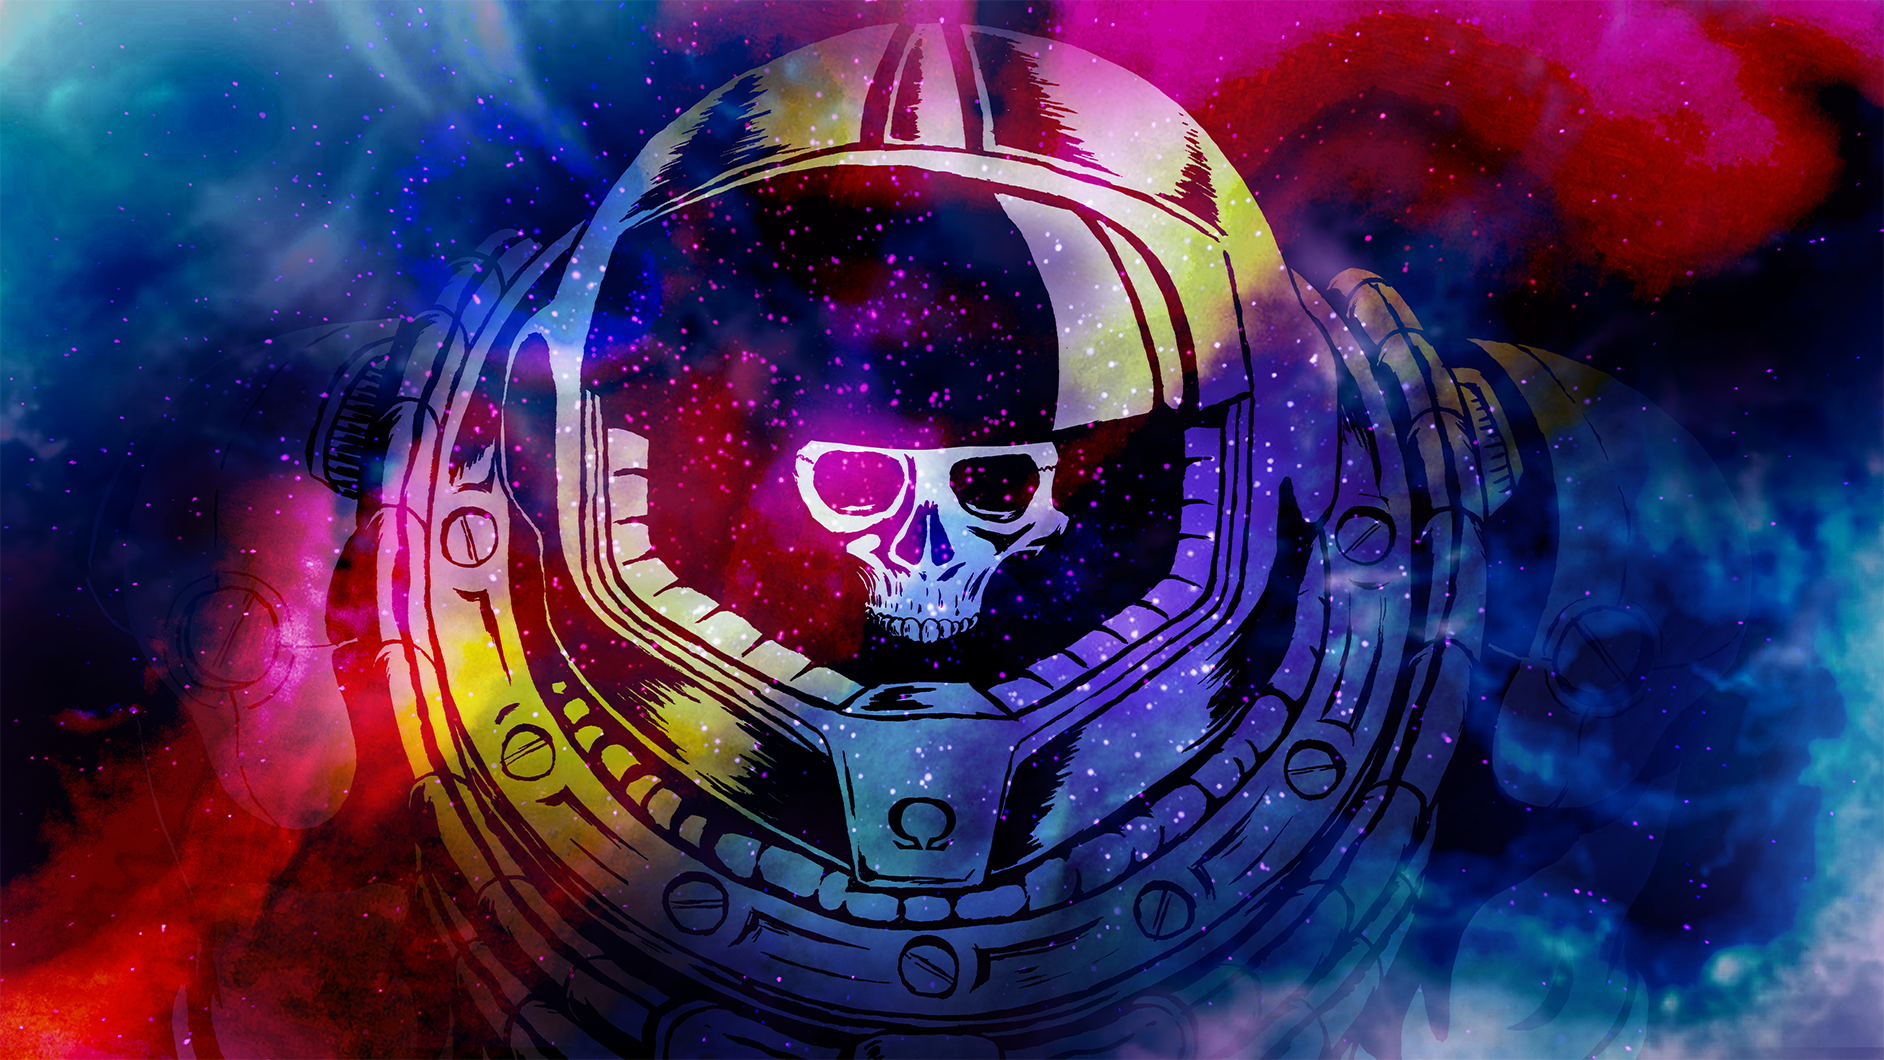 General 1884x1060 colorful Space Marine skull video game art armor digital art space